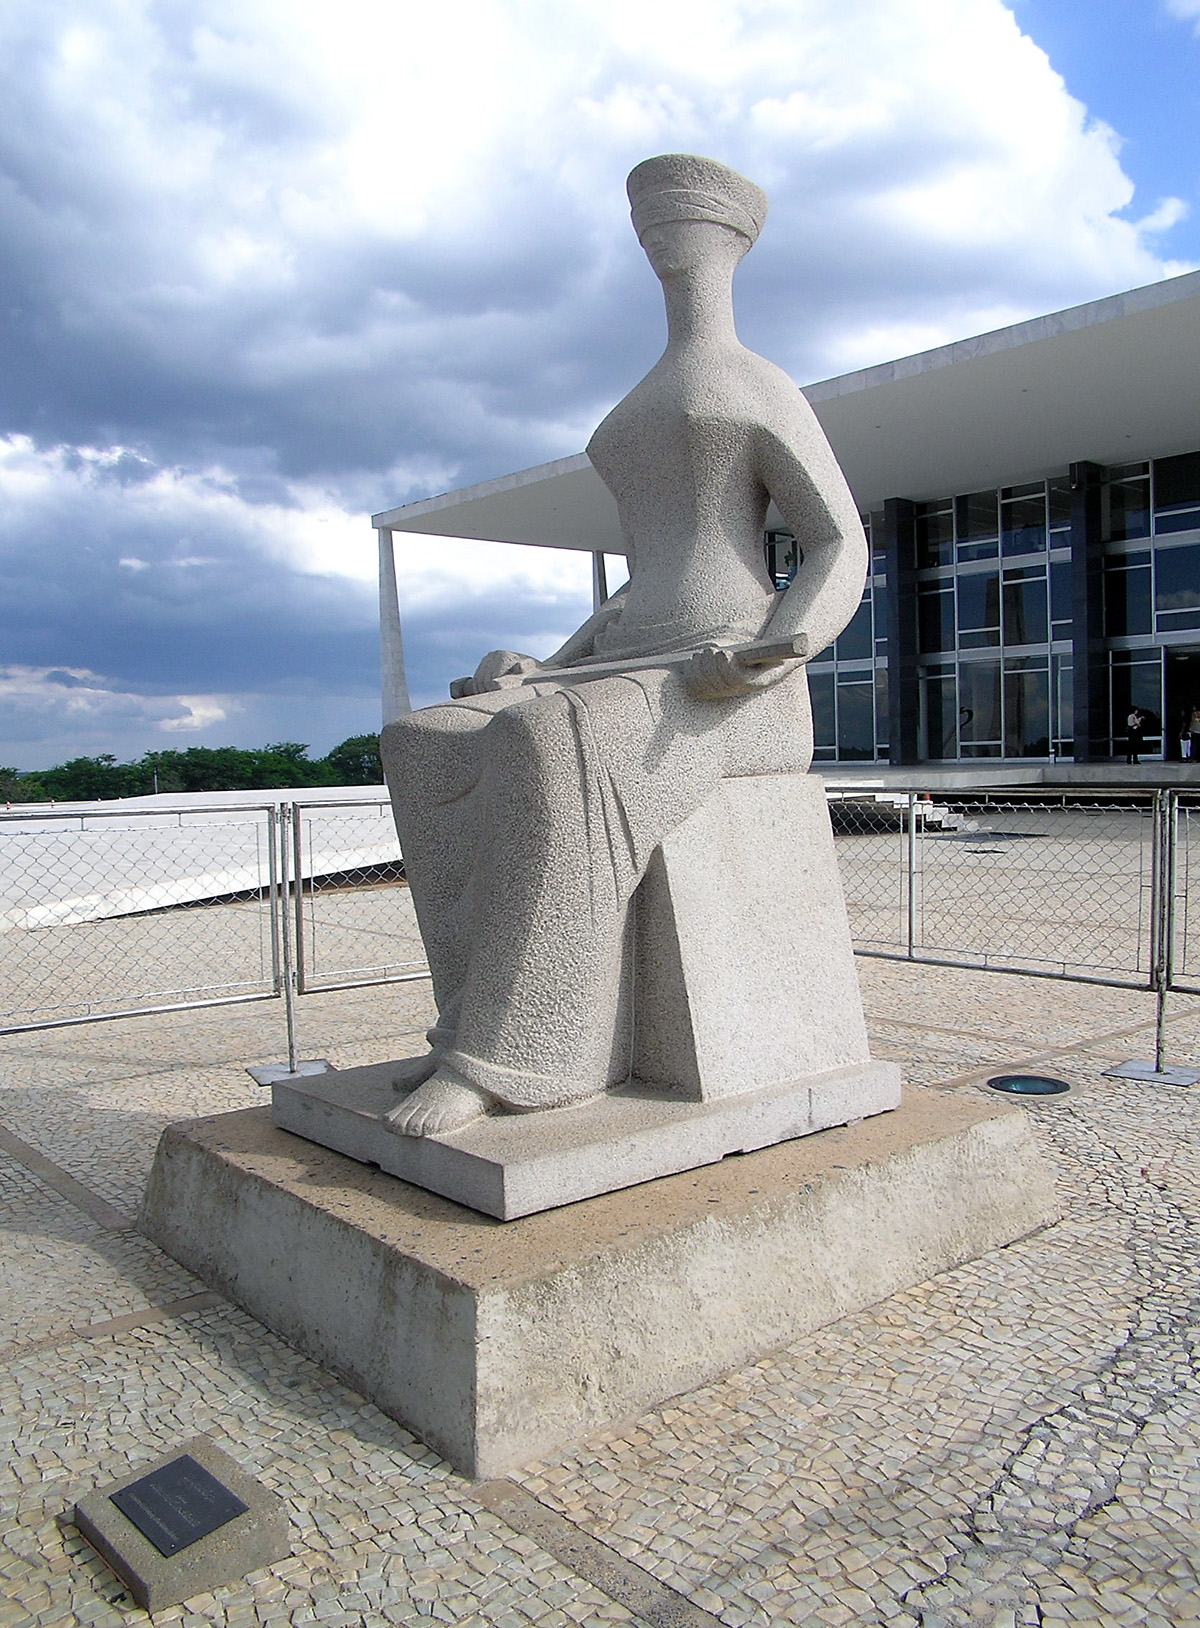 A Justiça, escultura de Alfredo Ceschiatti<a style='float:right' href='https://www3.al.sp.gov.br/repositorio/noticia/09-2010/JudiciarioA_Justica_Alfredo_Ceschiatti_Brasilia_Brasil.jpg' target=_blank><img src='/_img/material-file-download-white.png' width='14px' alt='Clique para baixar a imagem'></a>